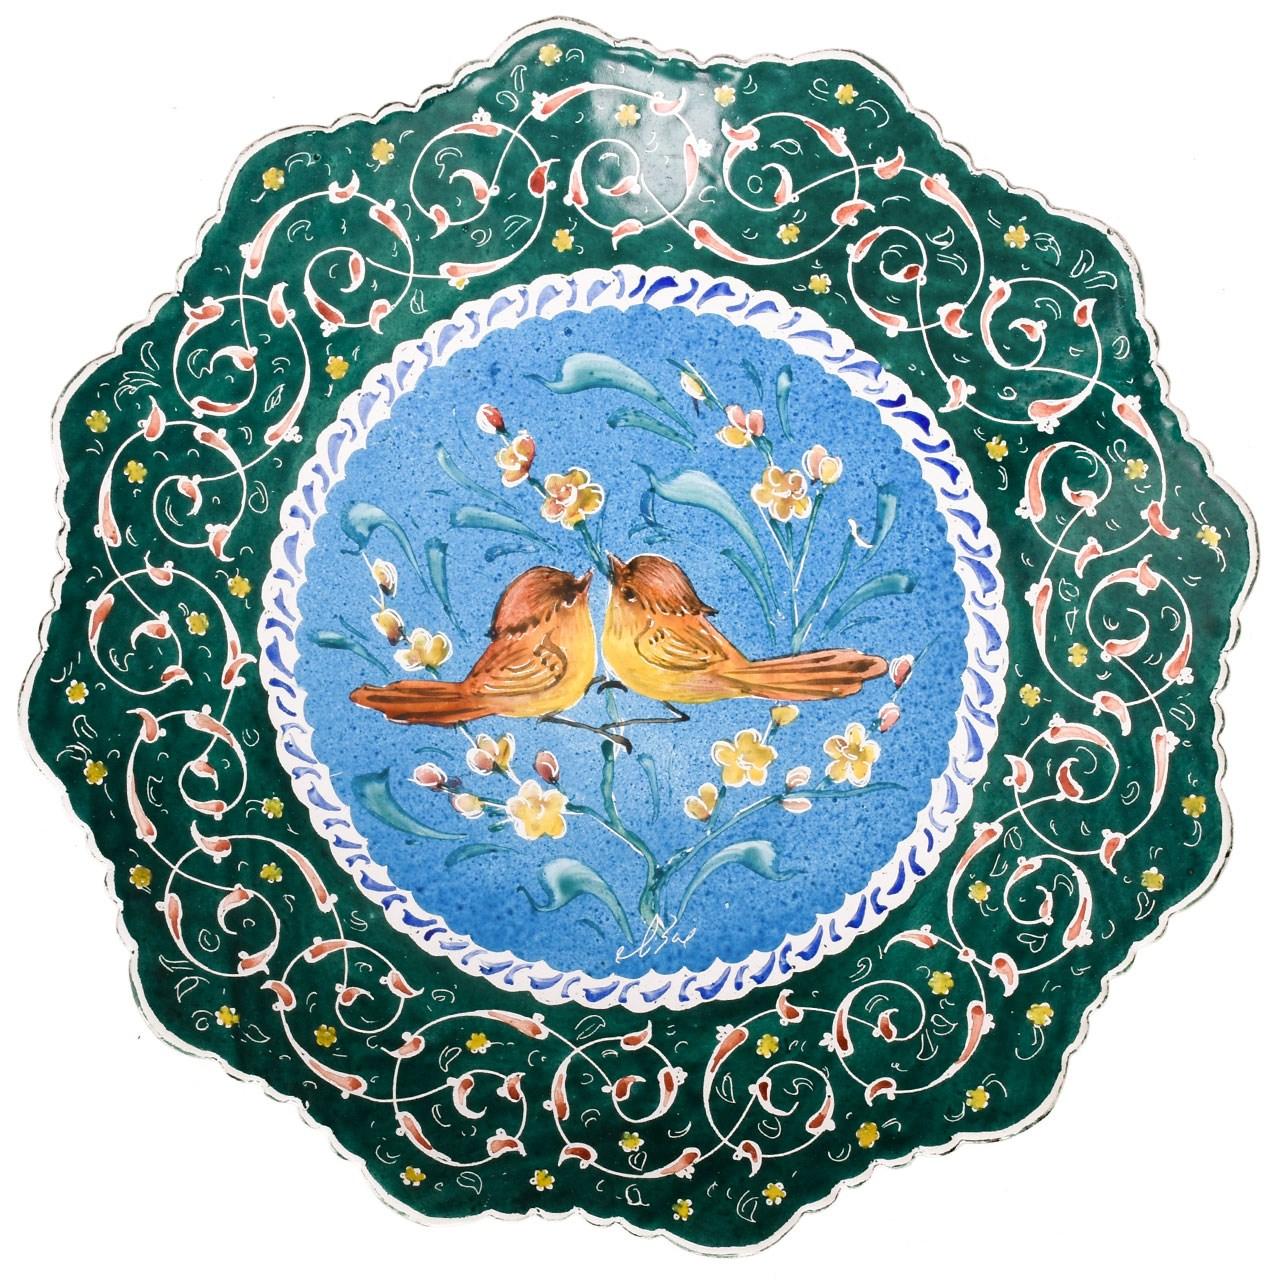 Copper Enamel Plate with 20 cm diameter, 14-00 Model